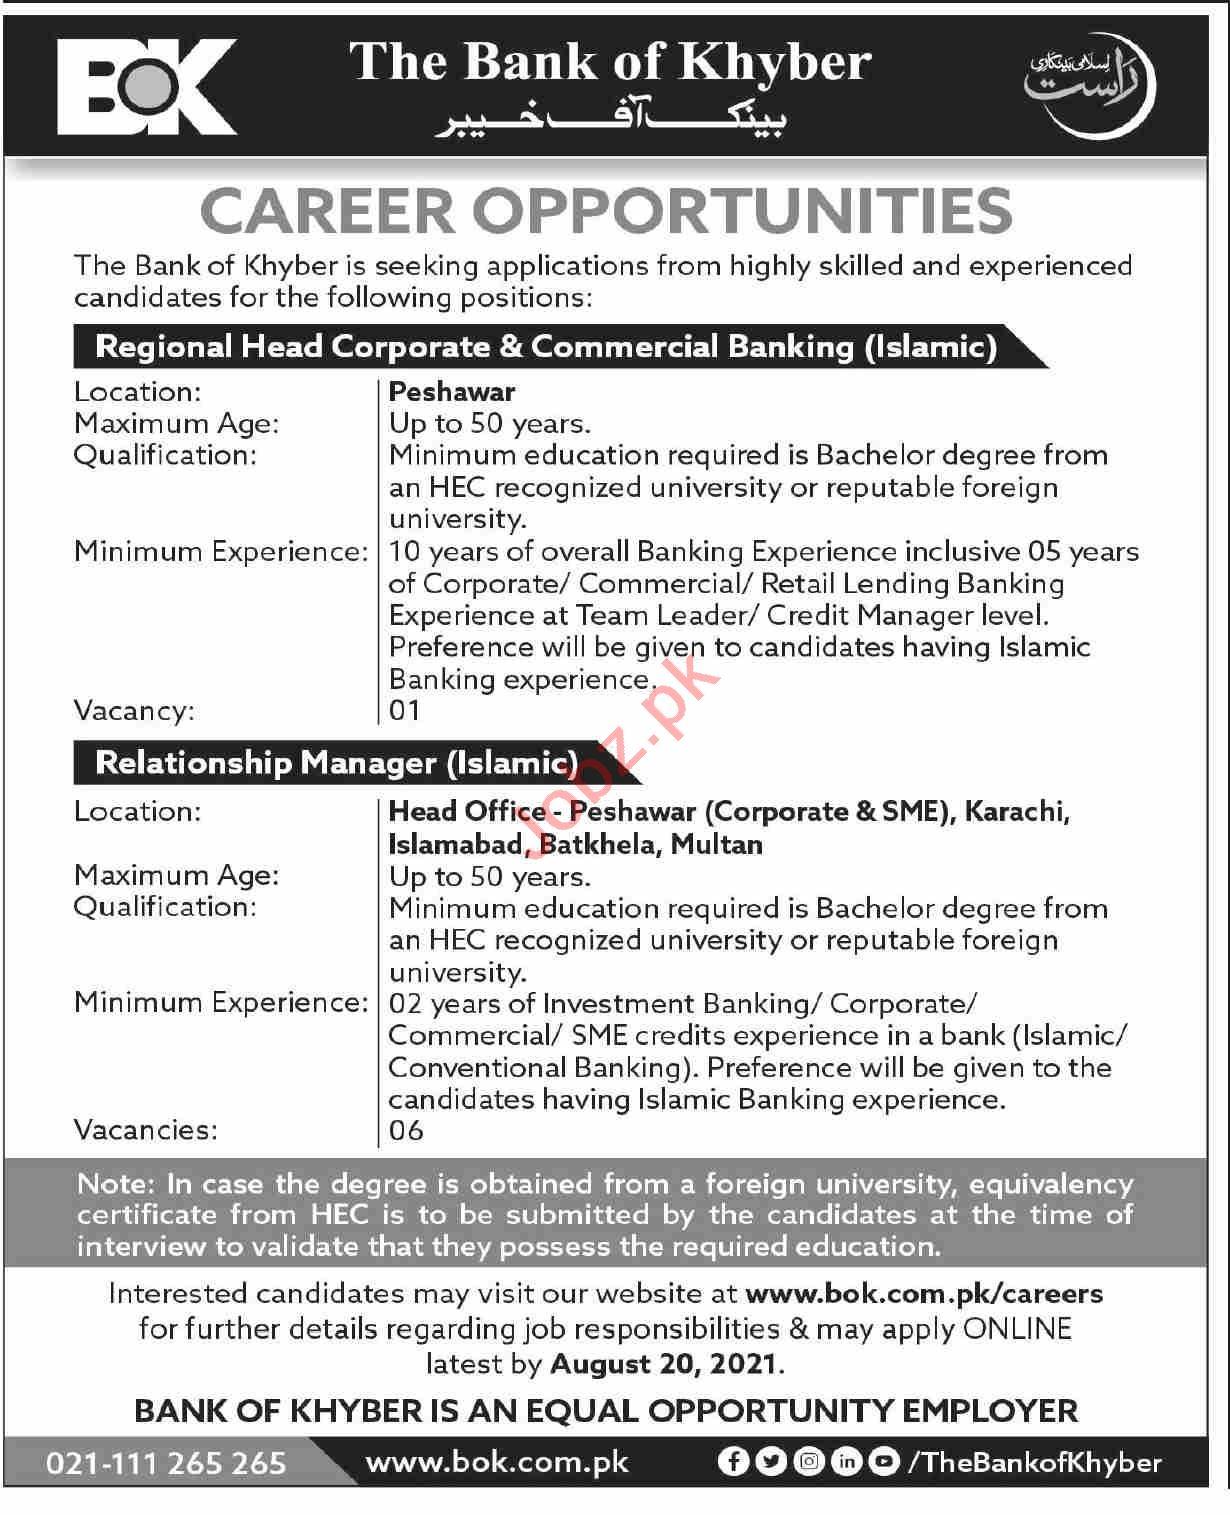 The Bank of Khyber BOK Jobs 2021 Regional Head Corporate